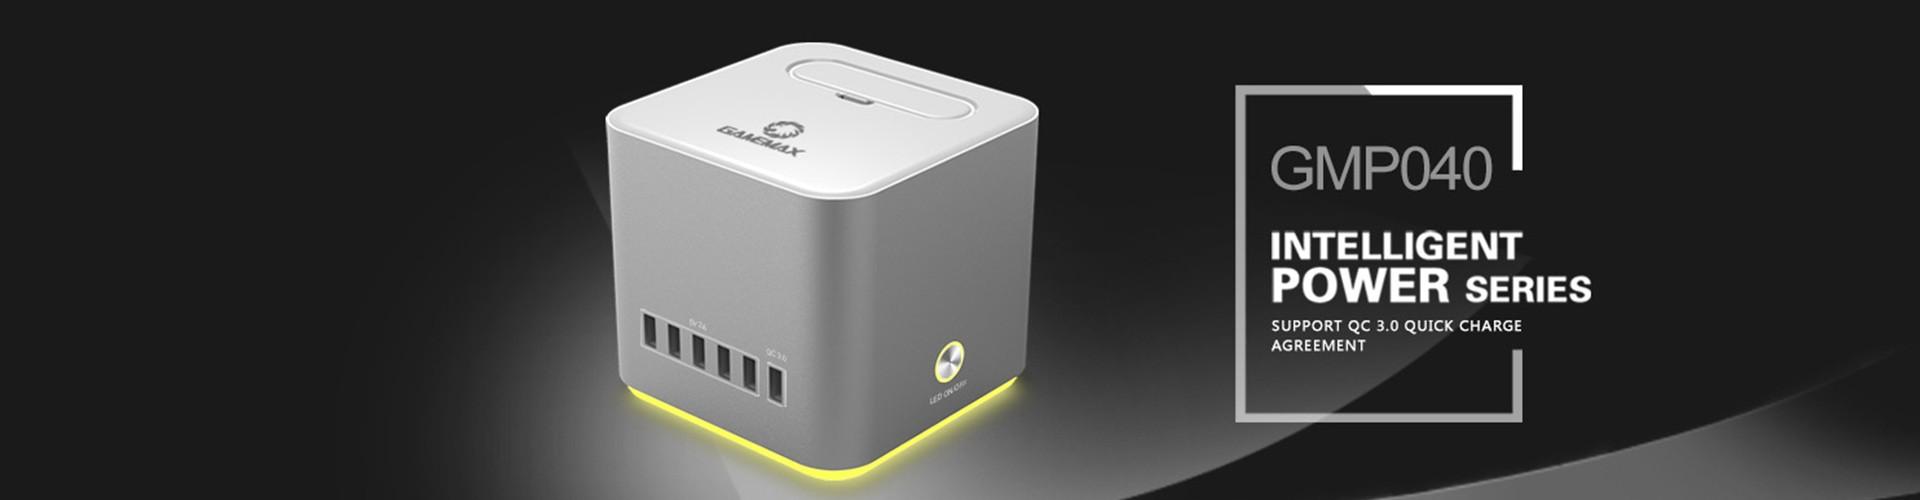 Smart Power Supply